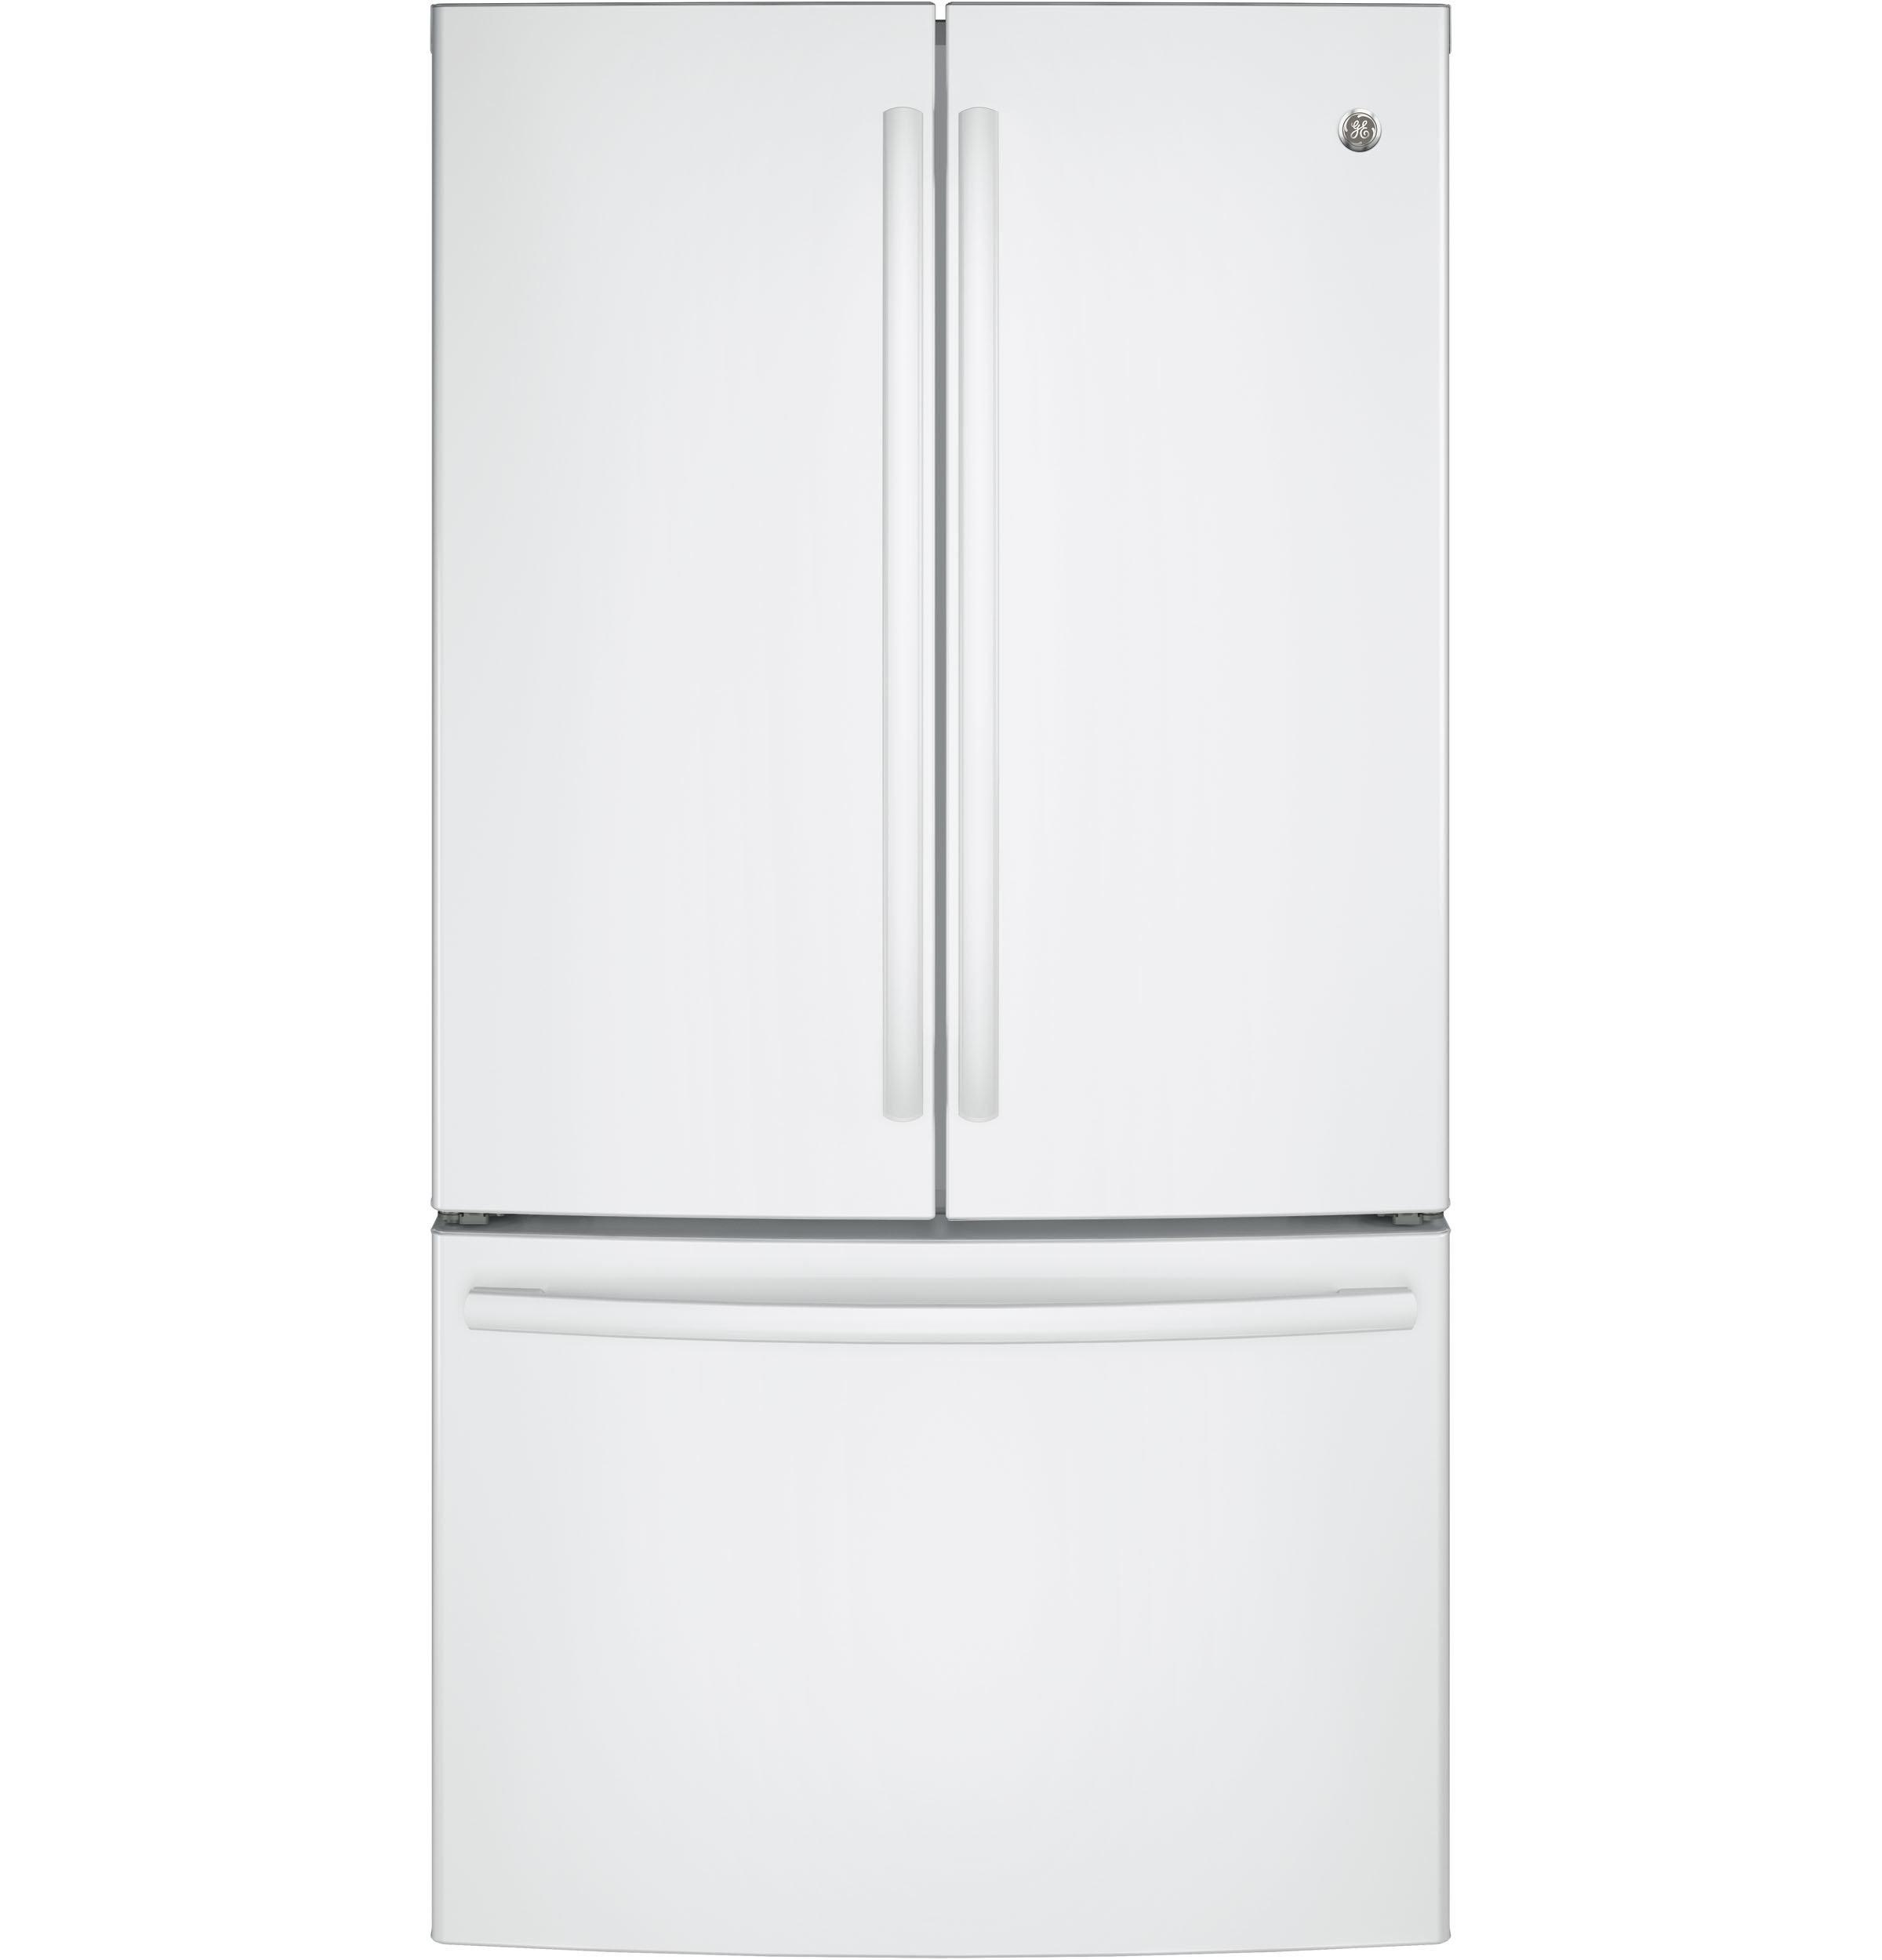 28.7CF White French Door Refrigerator BMT0000075886